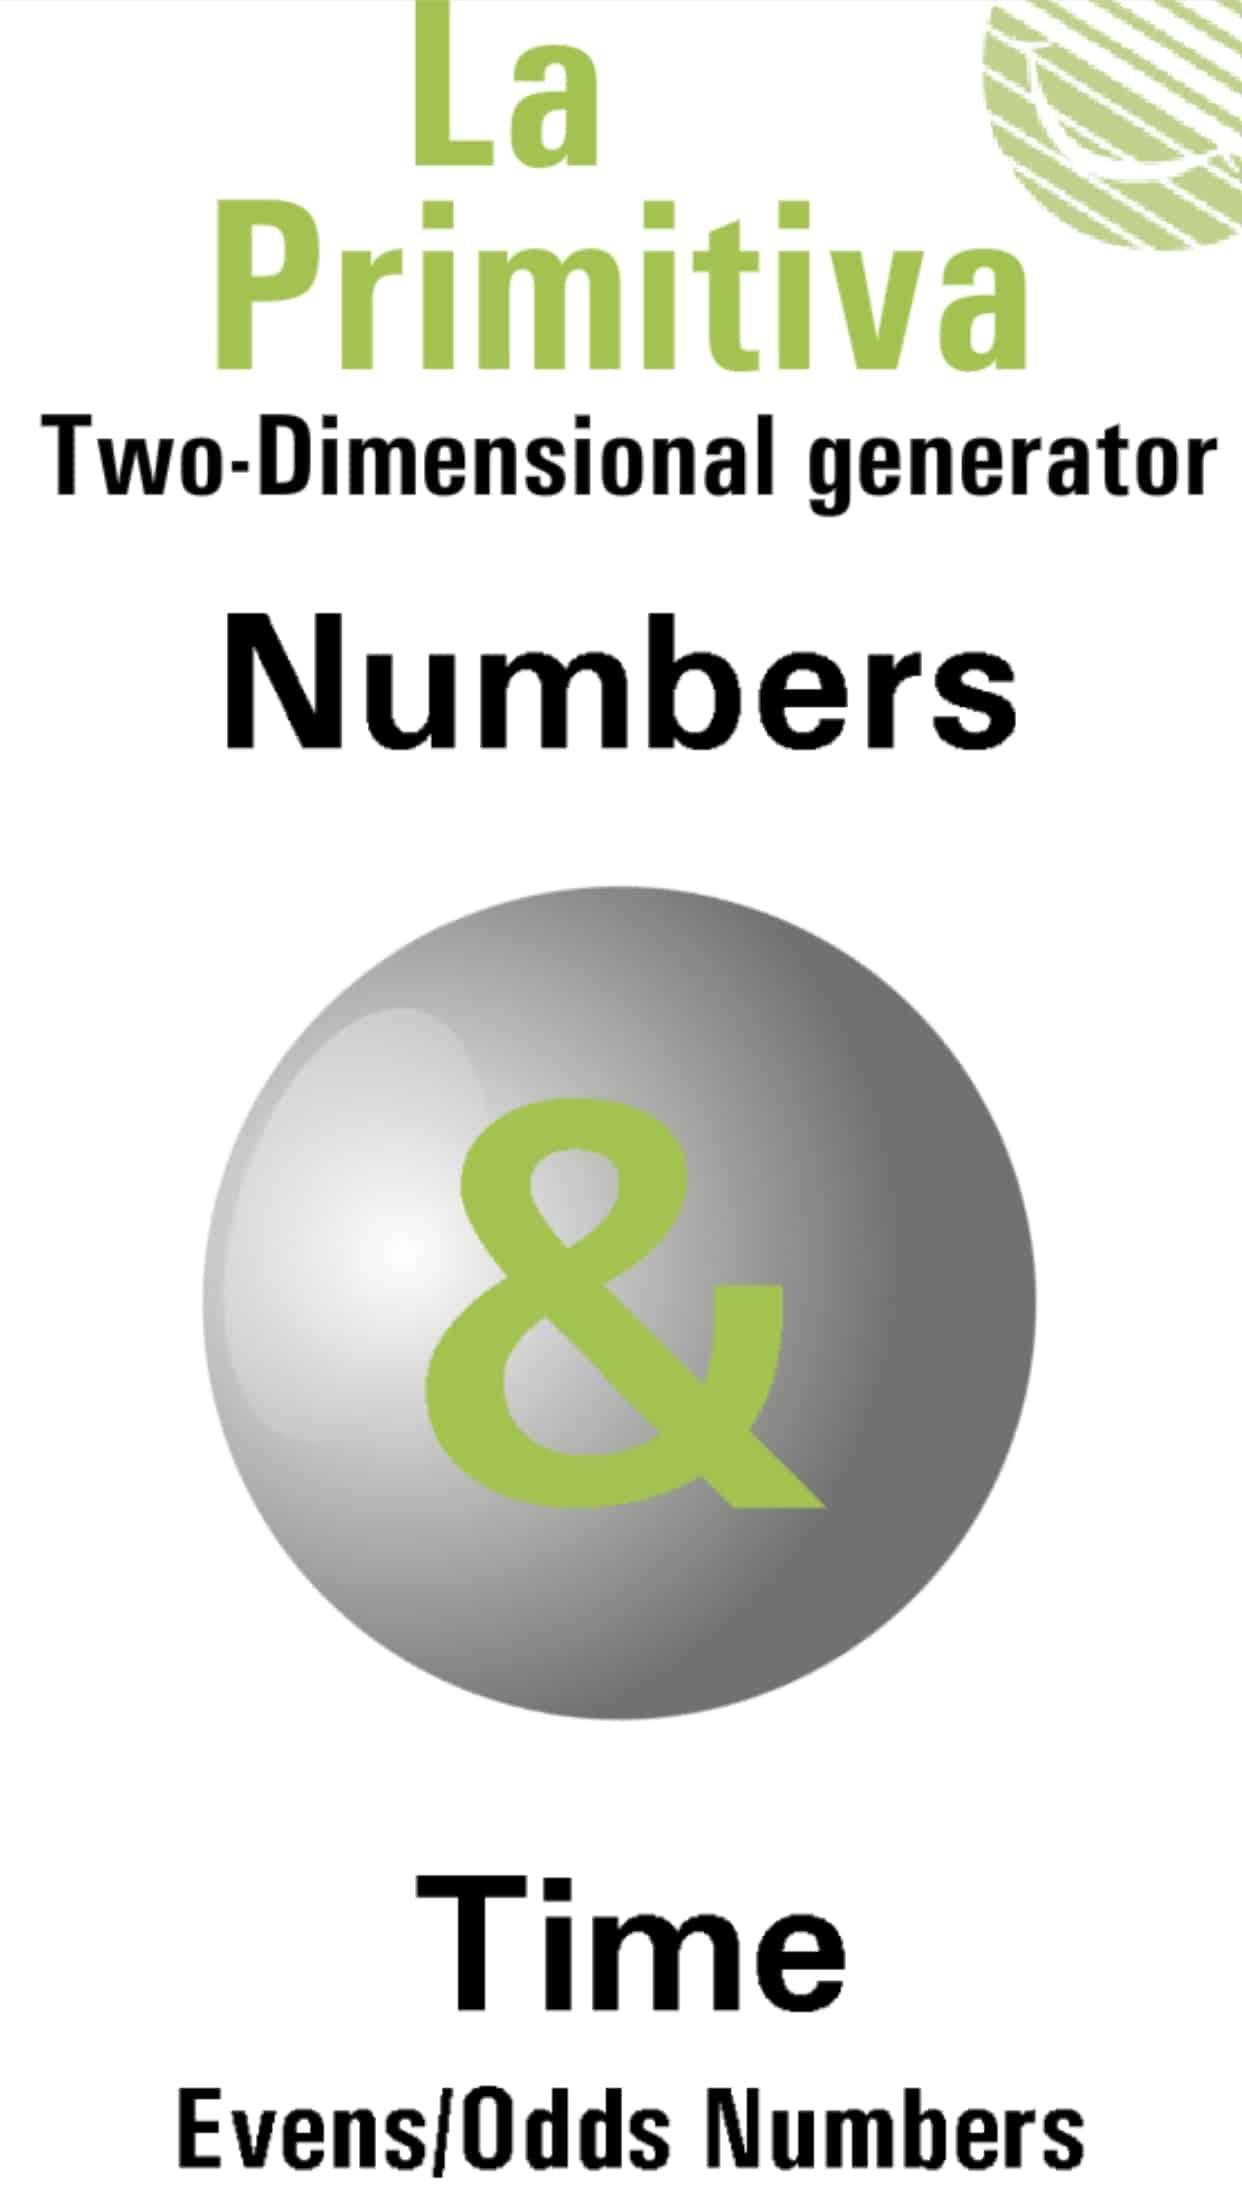 La Primitiva - Spanish Lottery | Results, Tips & Winning Numbers